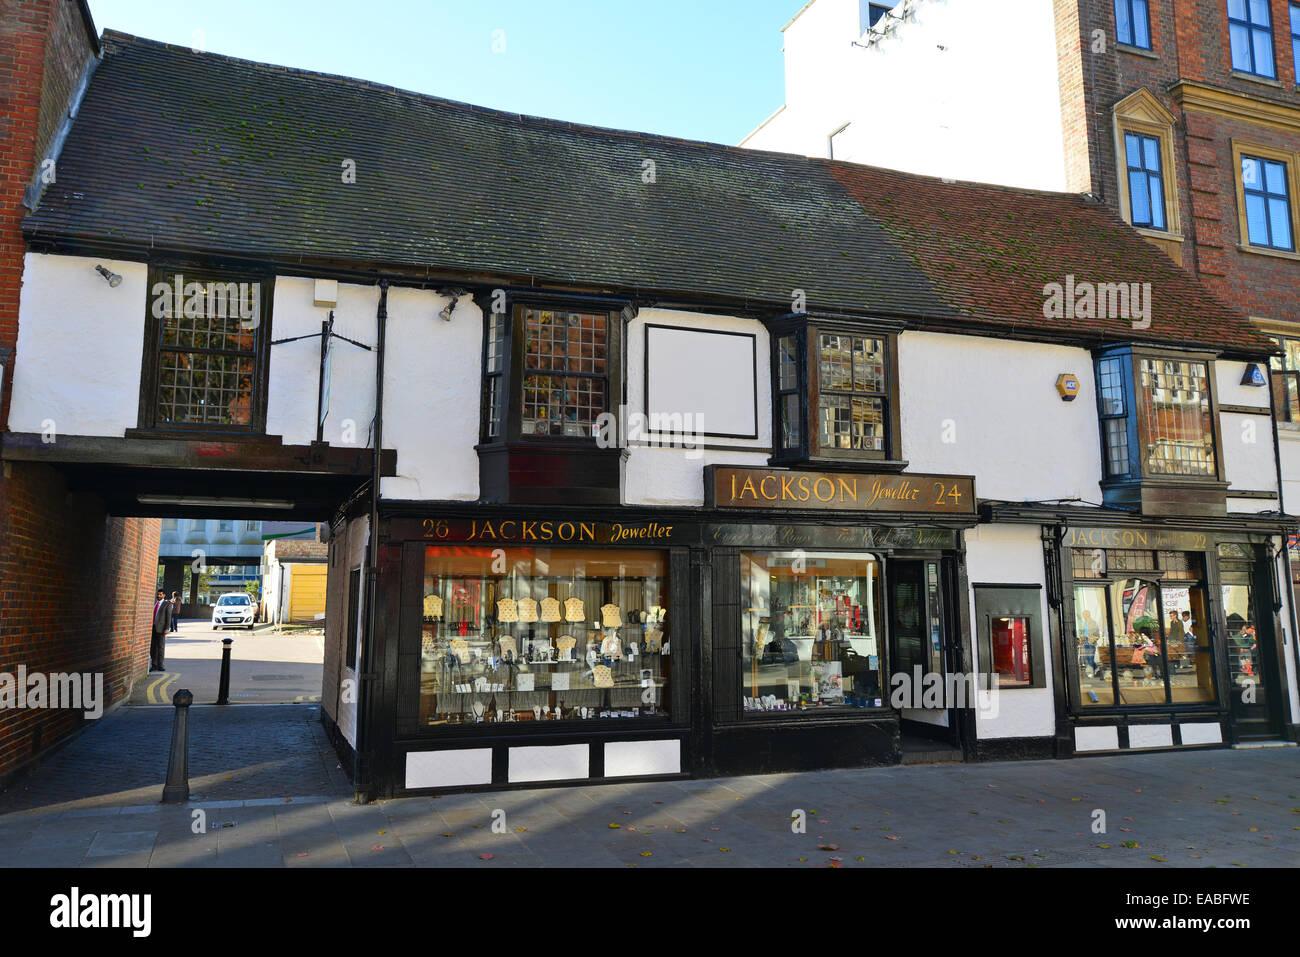 15th century openhall building (Jackson Jewellers), High Street, Watford, Hertfordshire, England, United Kingdom - Stock Image